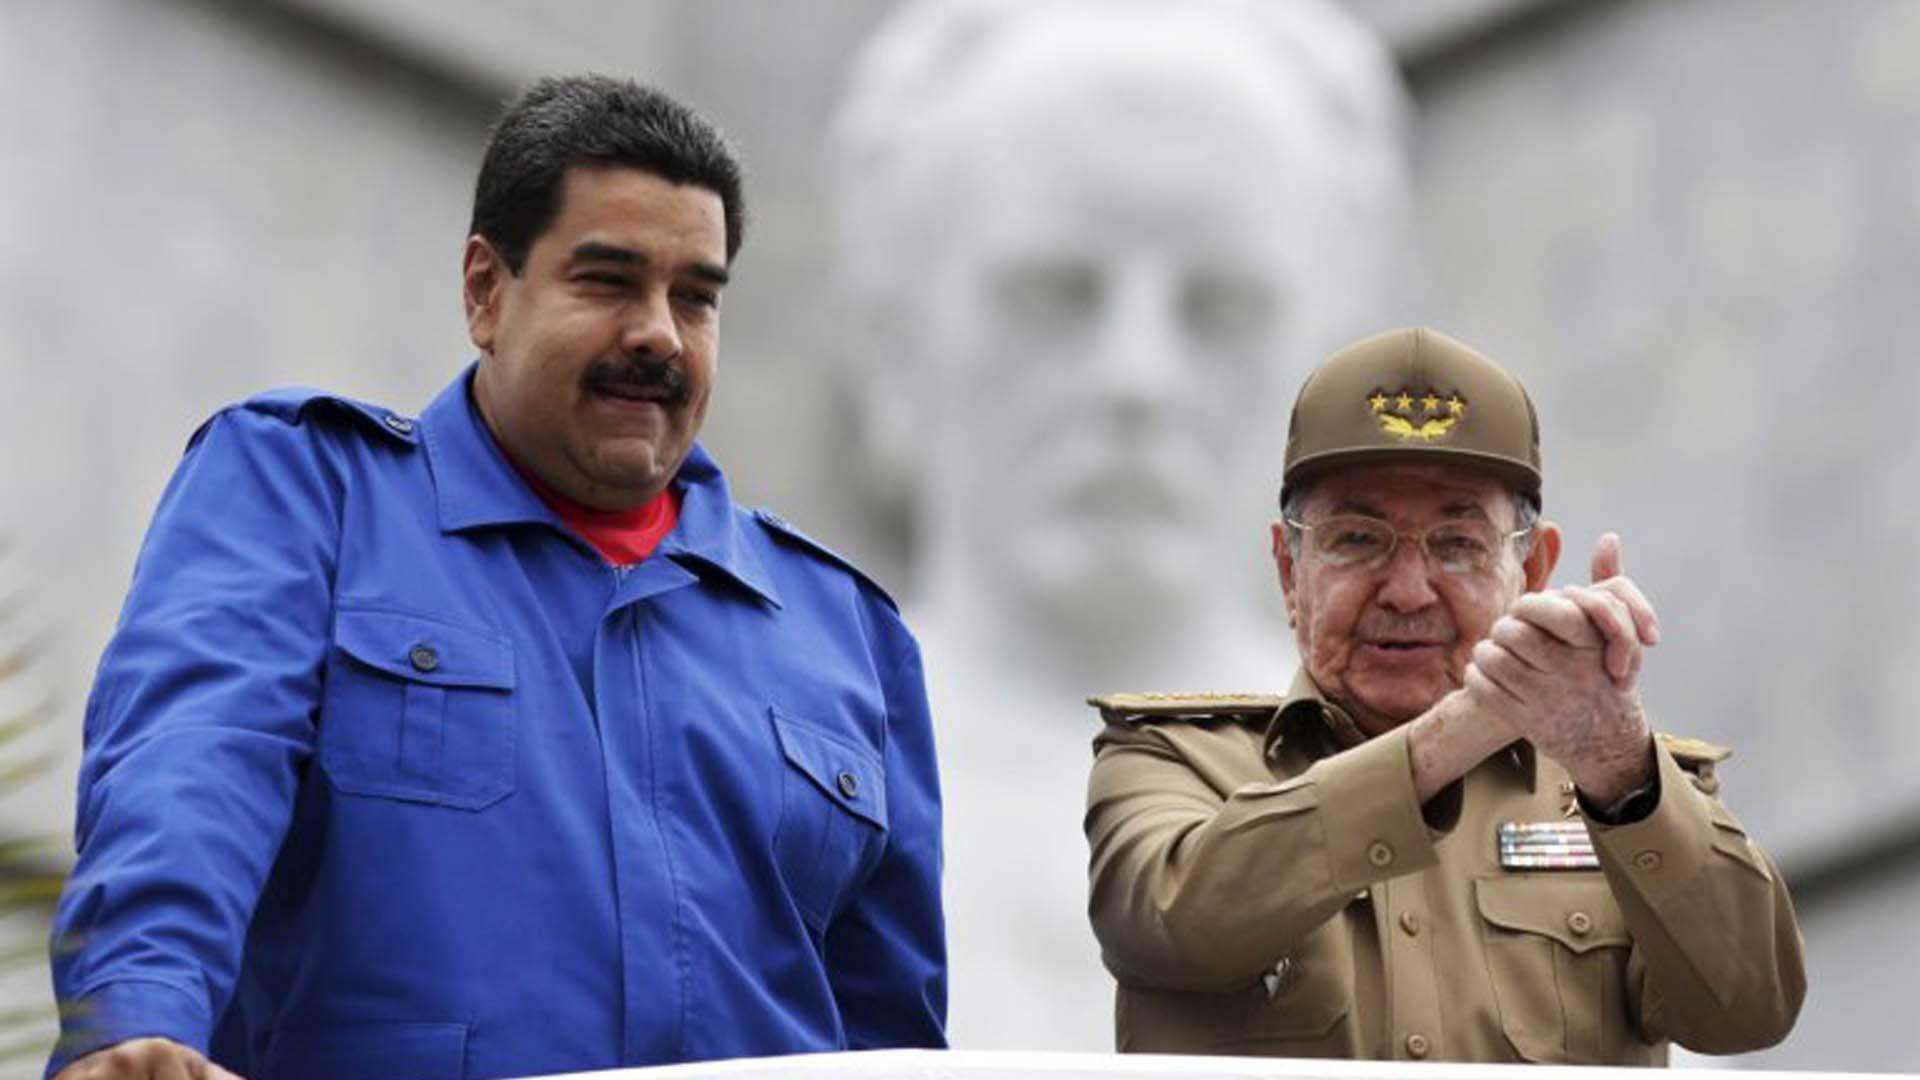 Madurojuntoal líder cubano, Raúl Castro. Foto: AFP.